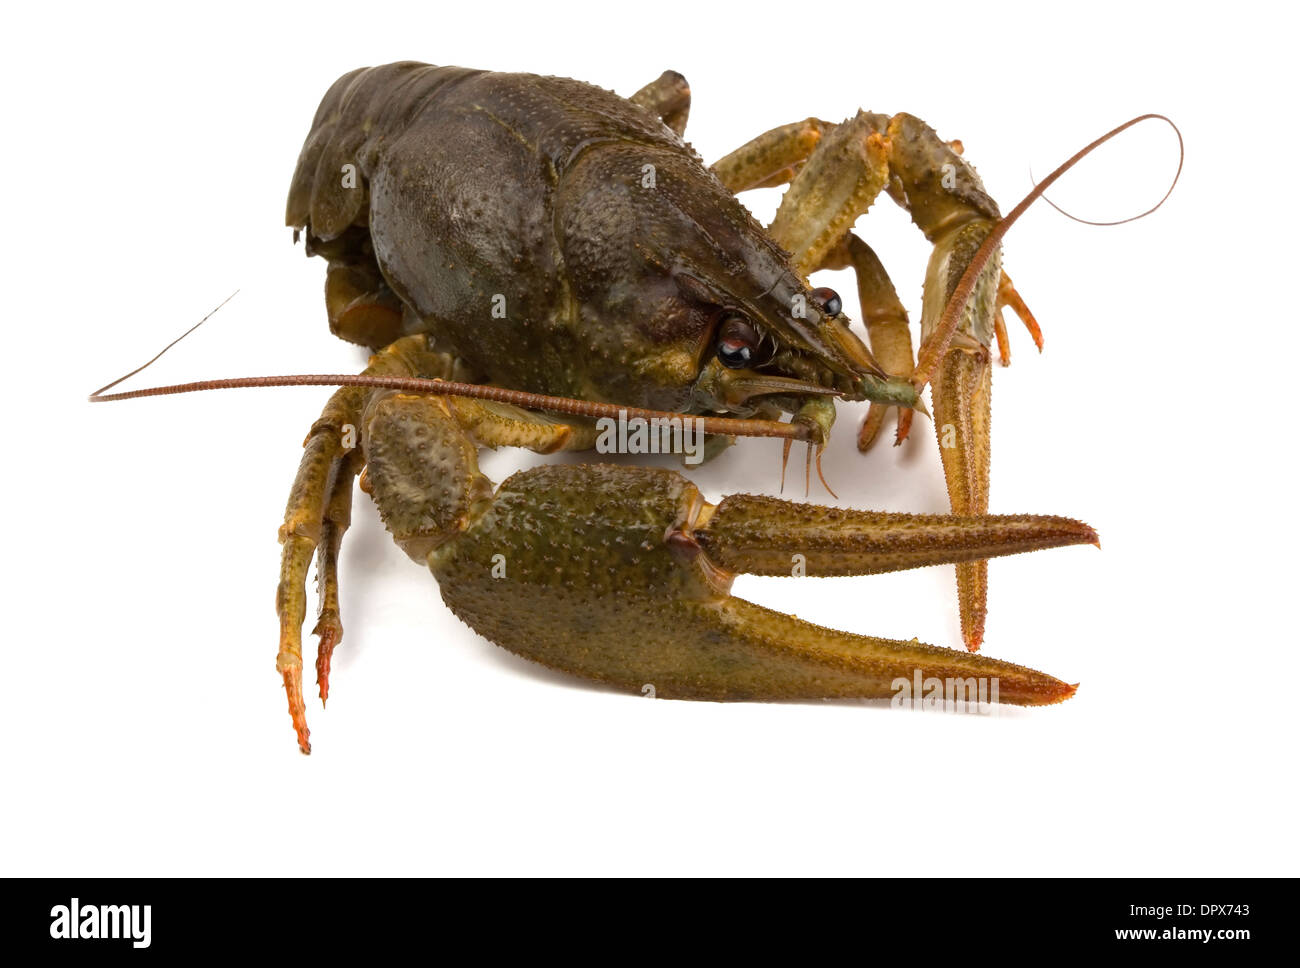 Big alive river crayfish isolated on white - Stock Image